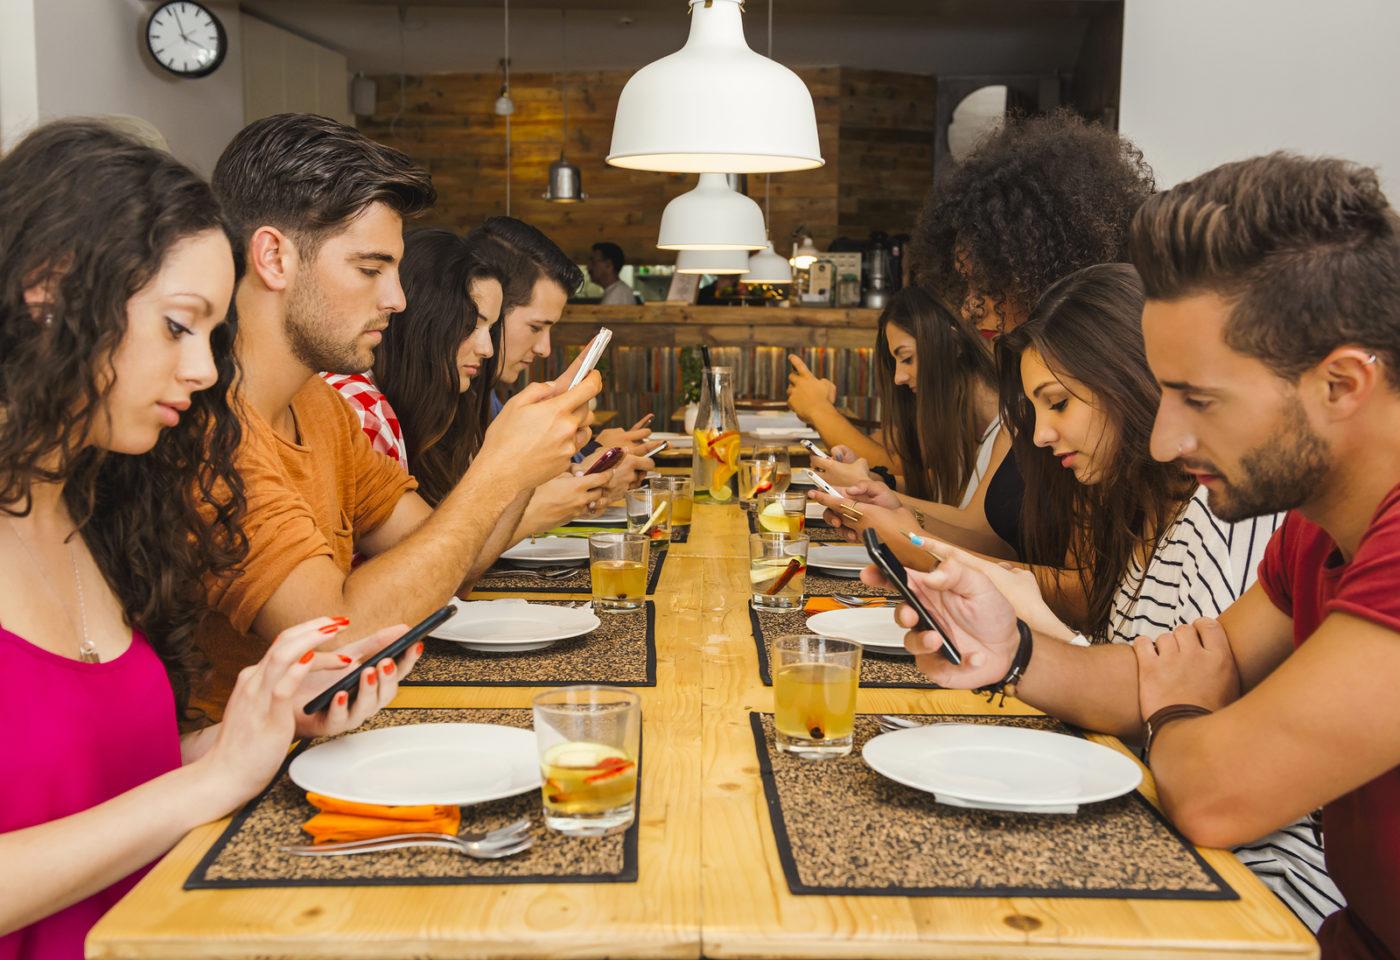 cell phone etiquette